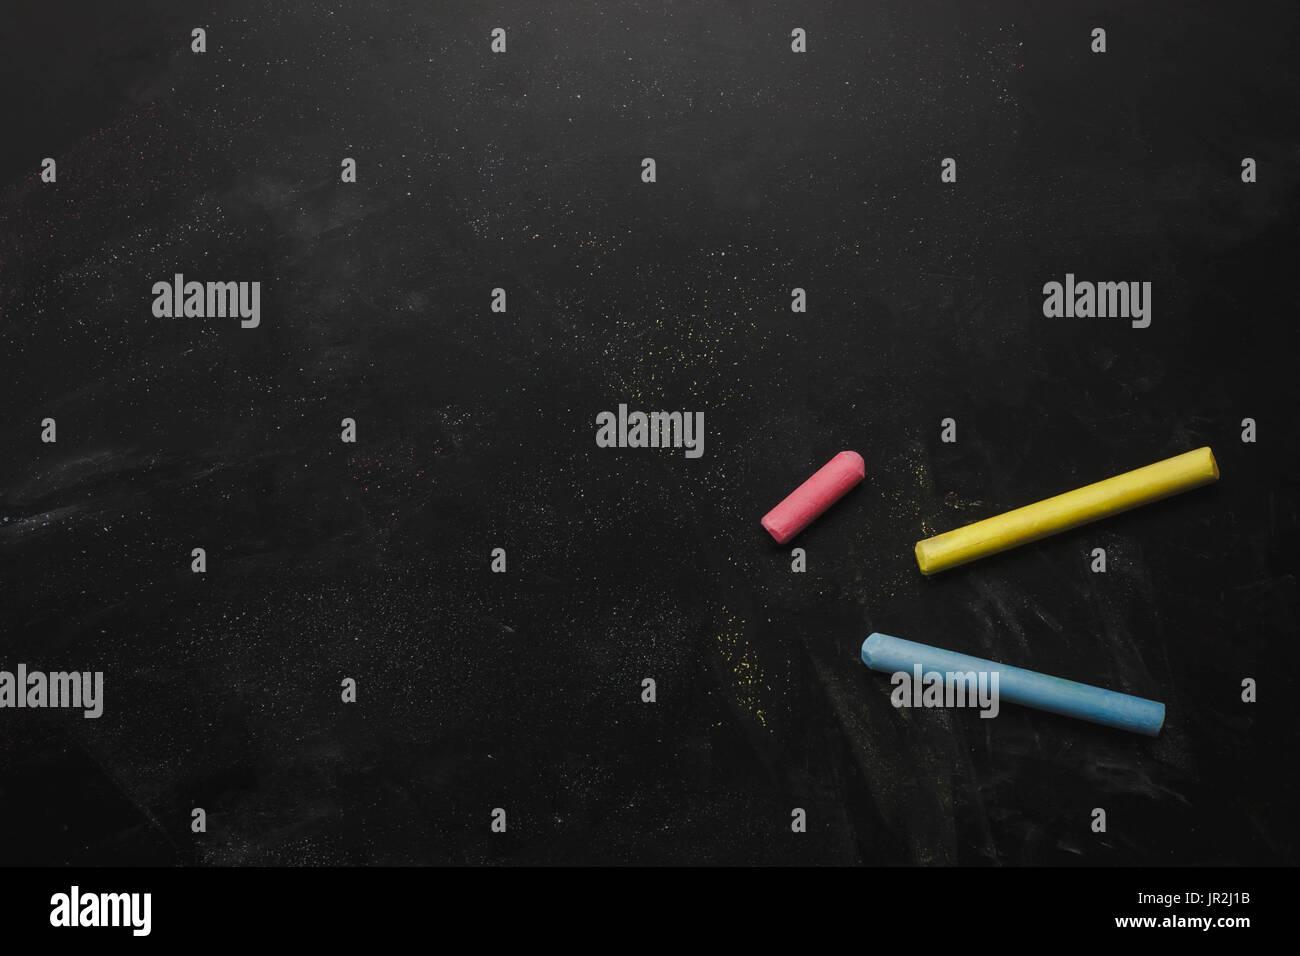 Line Drawing Alphabet Stock Photos Amp Line Drawing Alphabet